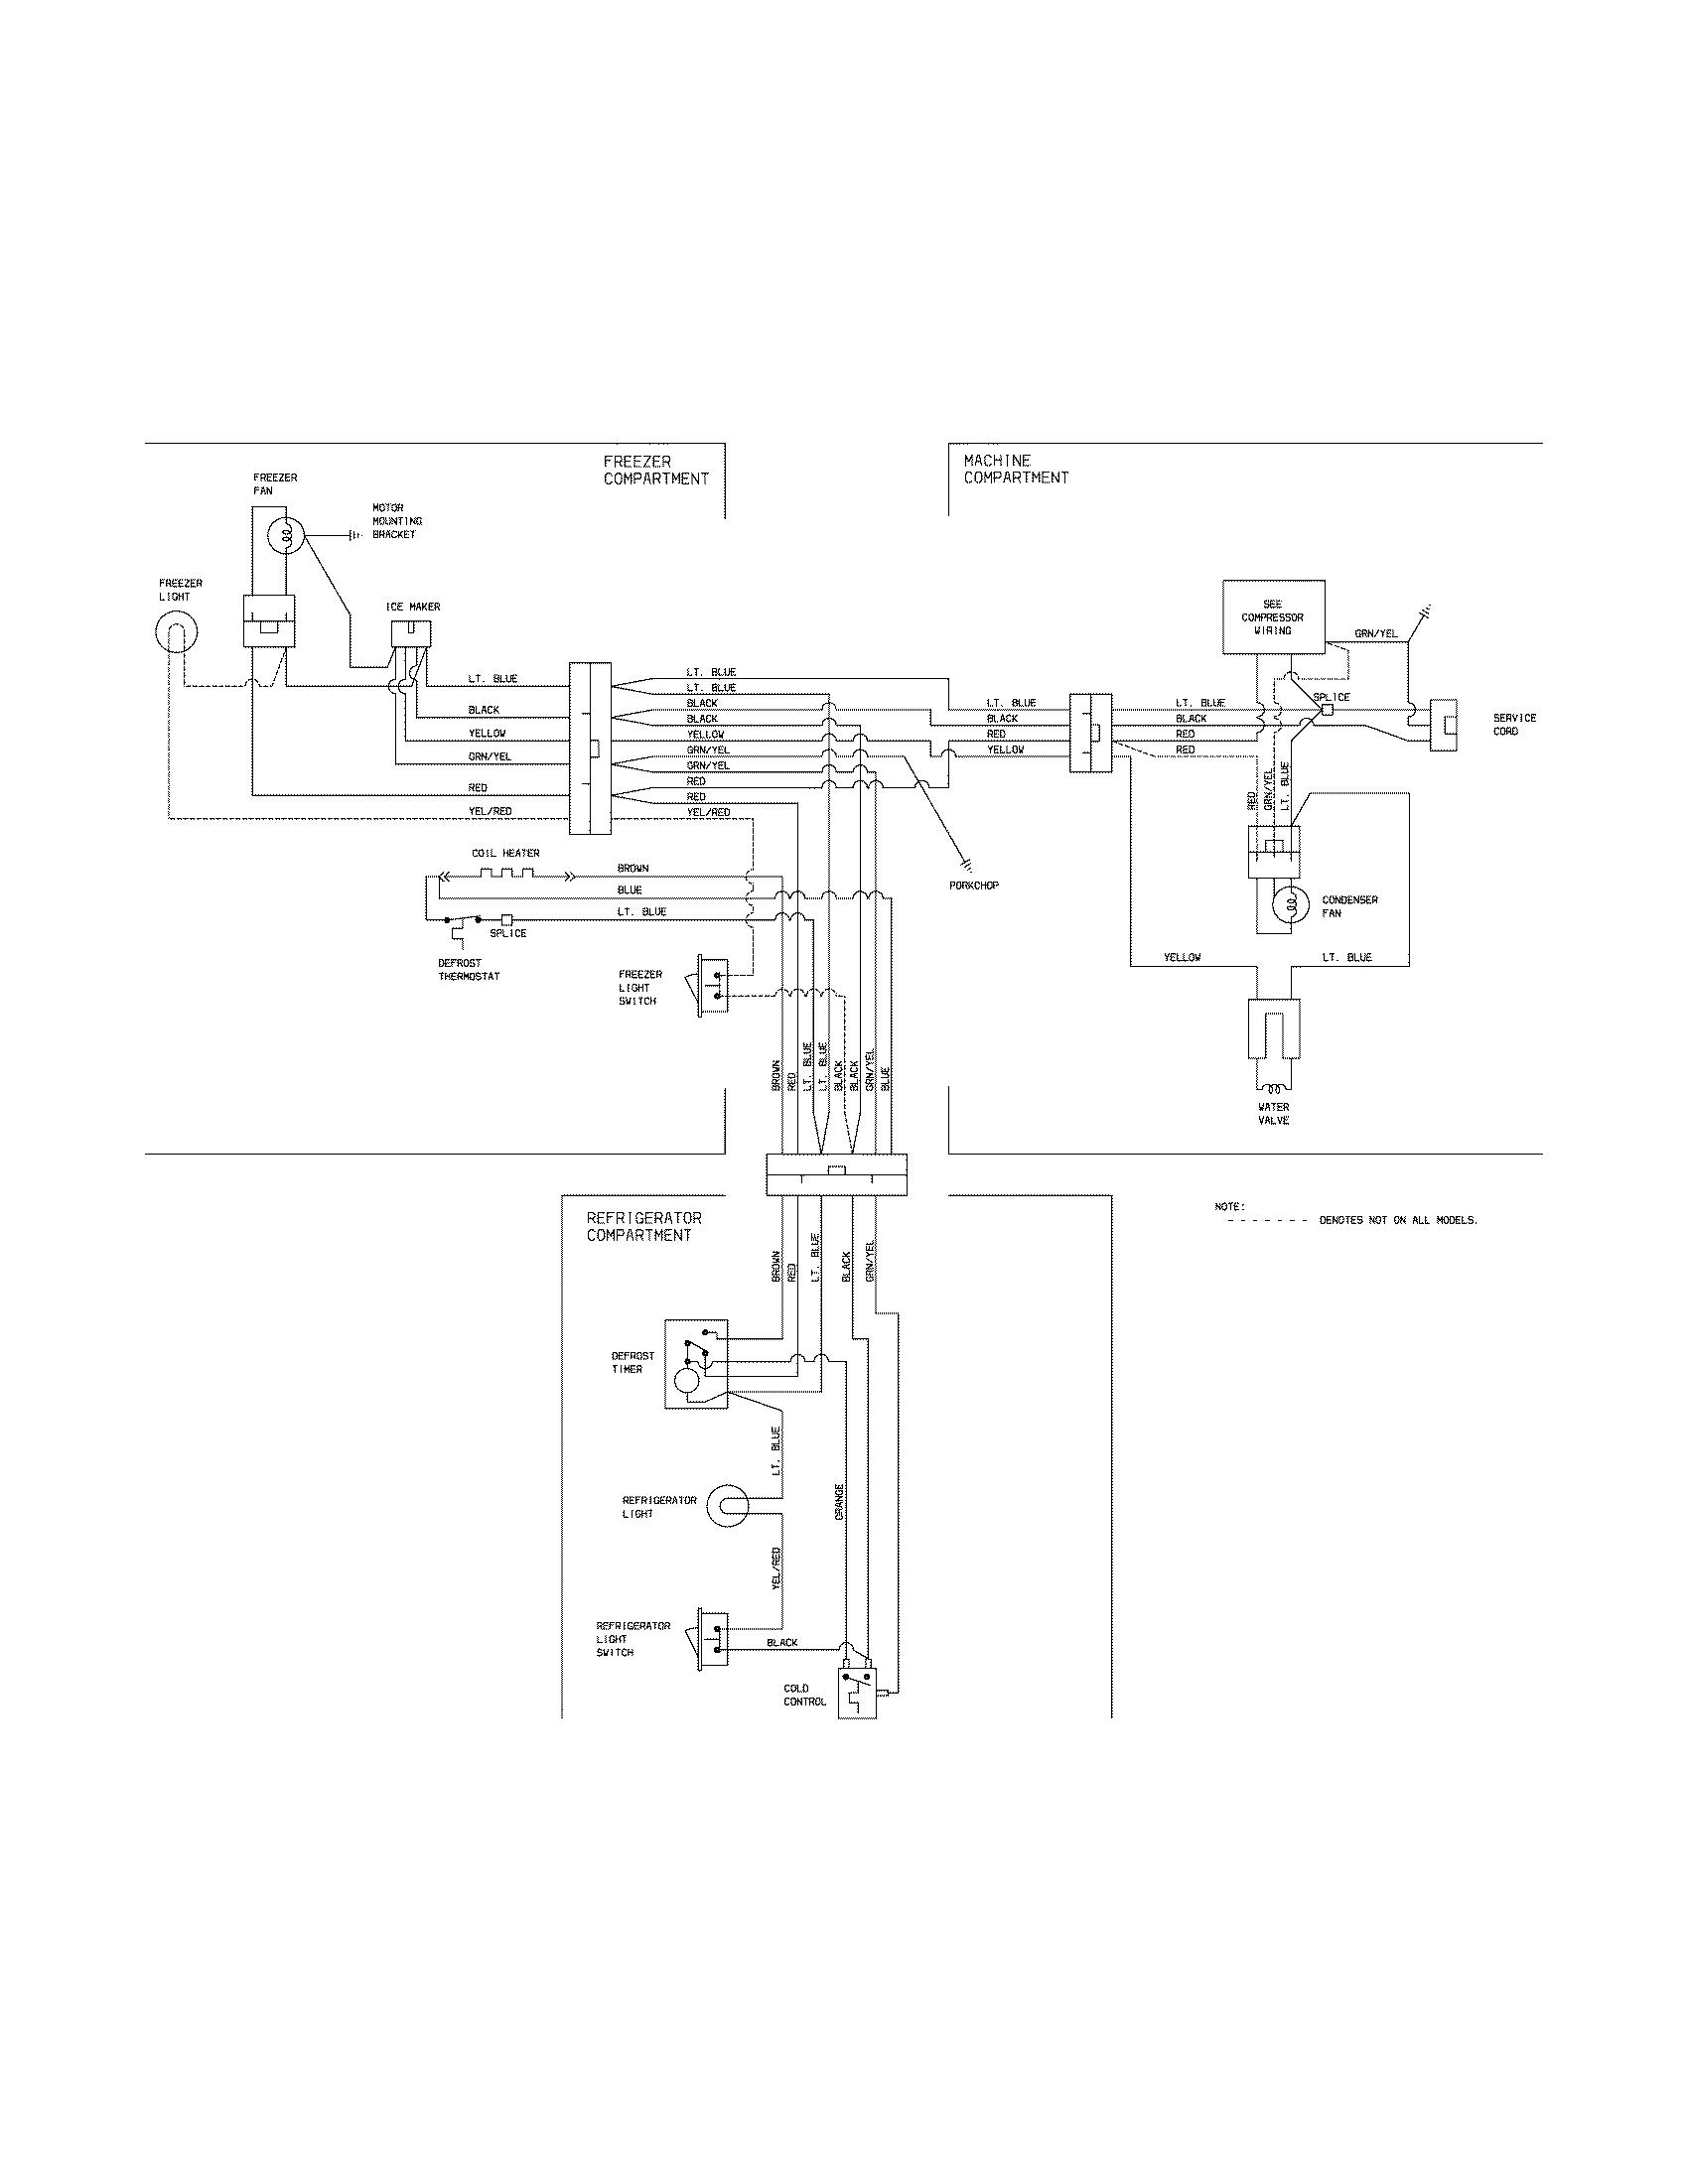 hight resolution of frigidaire glrt86tek4 wiring diagram diagram